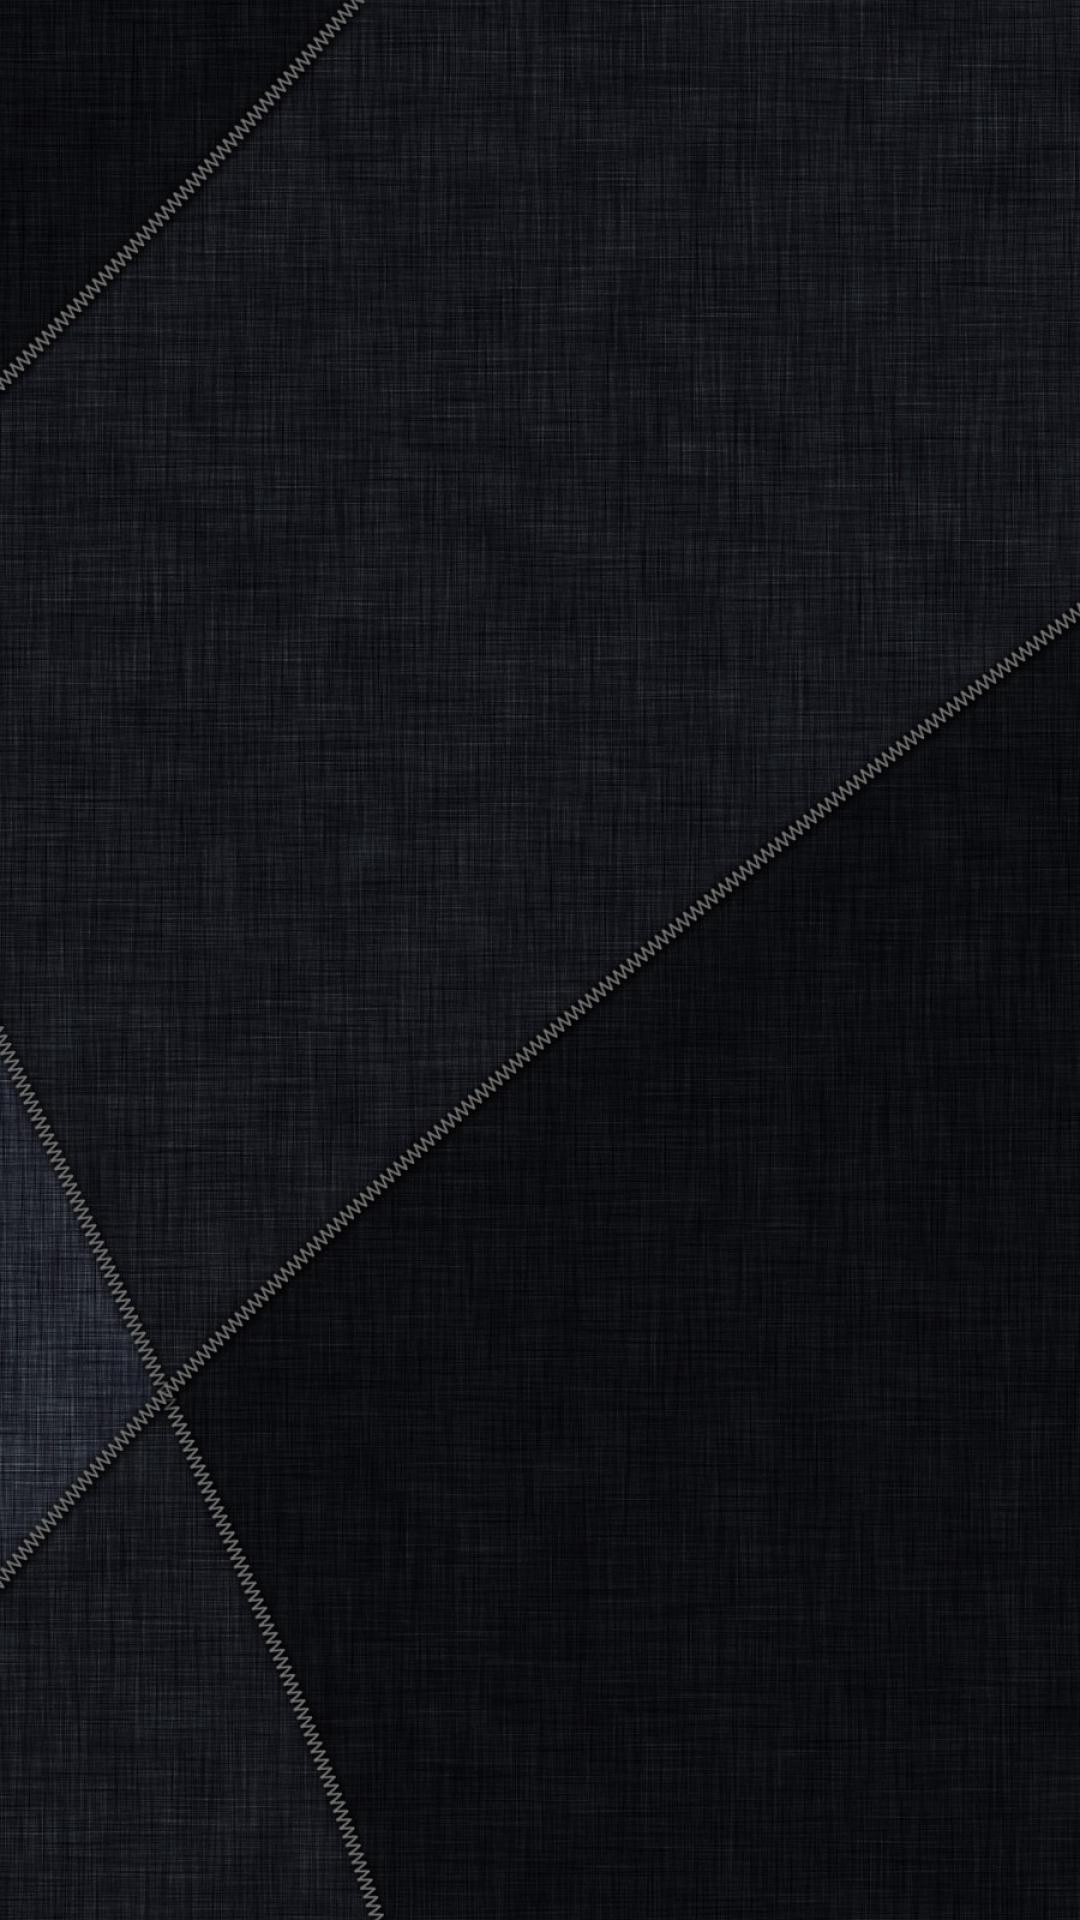 nexus 5 stock wallpaper xda